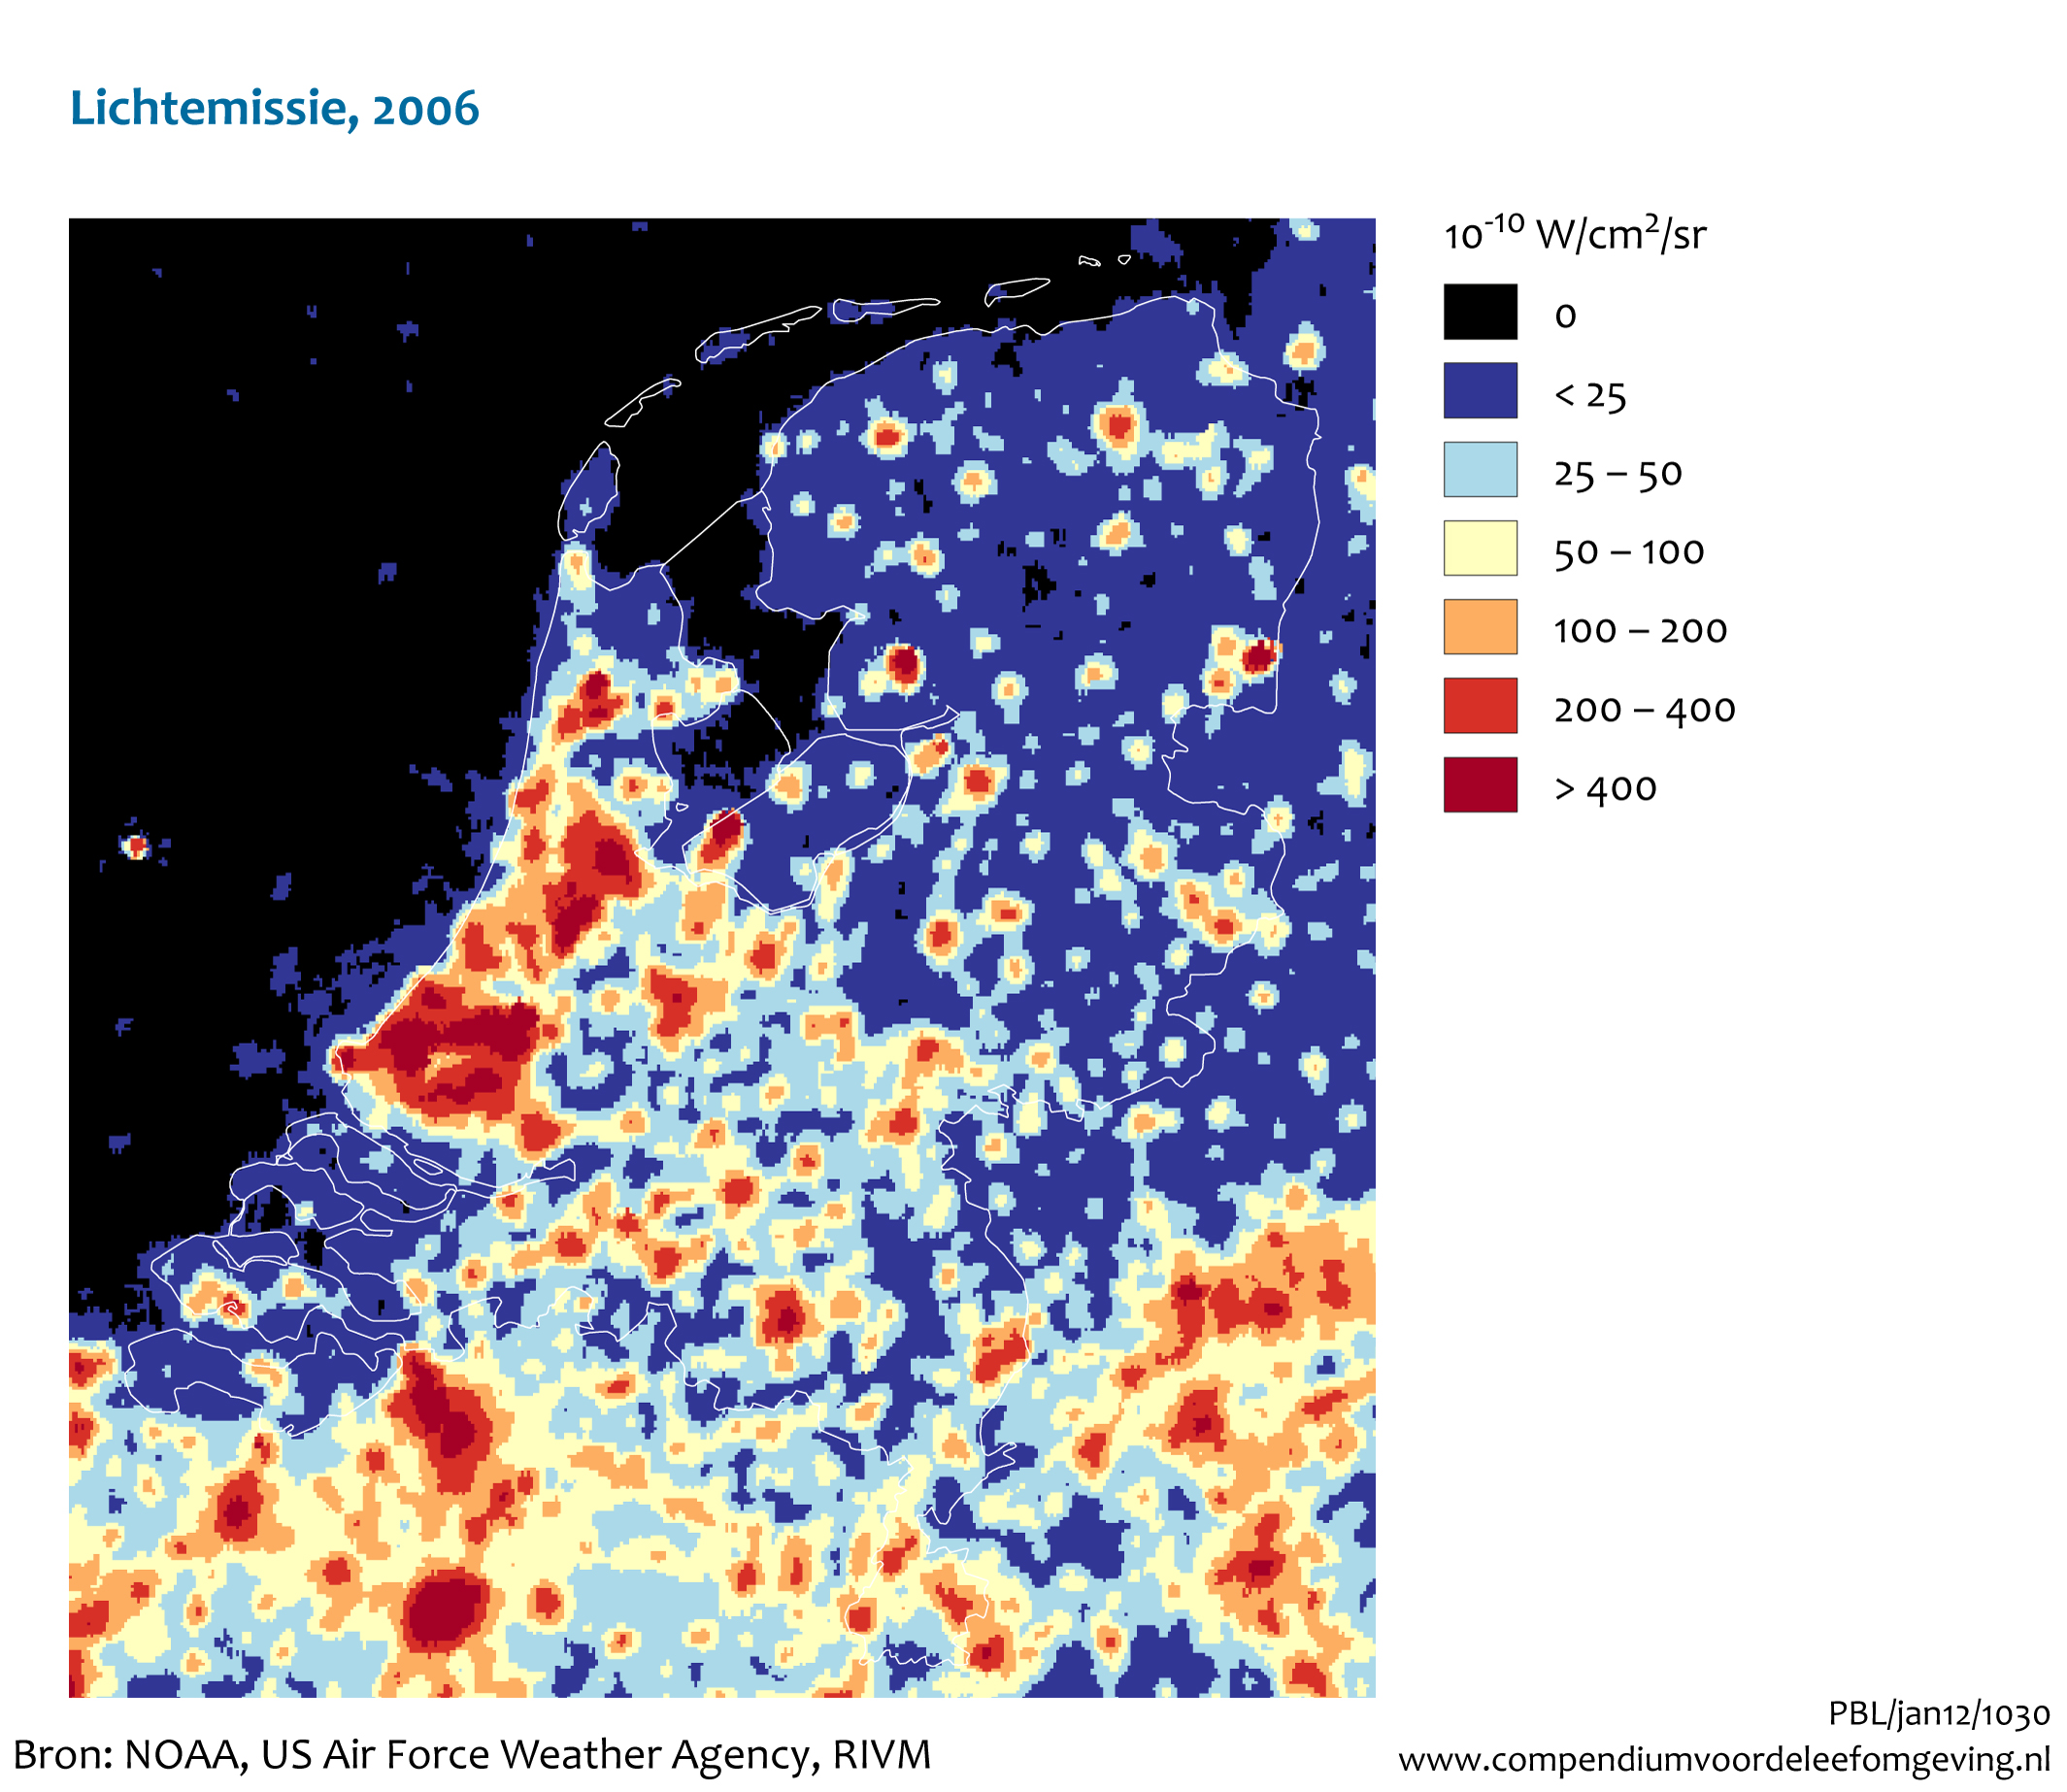 http://www.clo.nl/sites/default/files/infographics/1030_002k_clo_03_nl.jpg